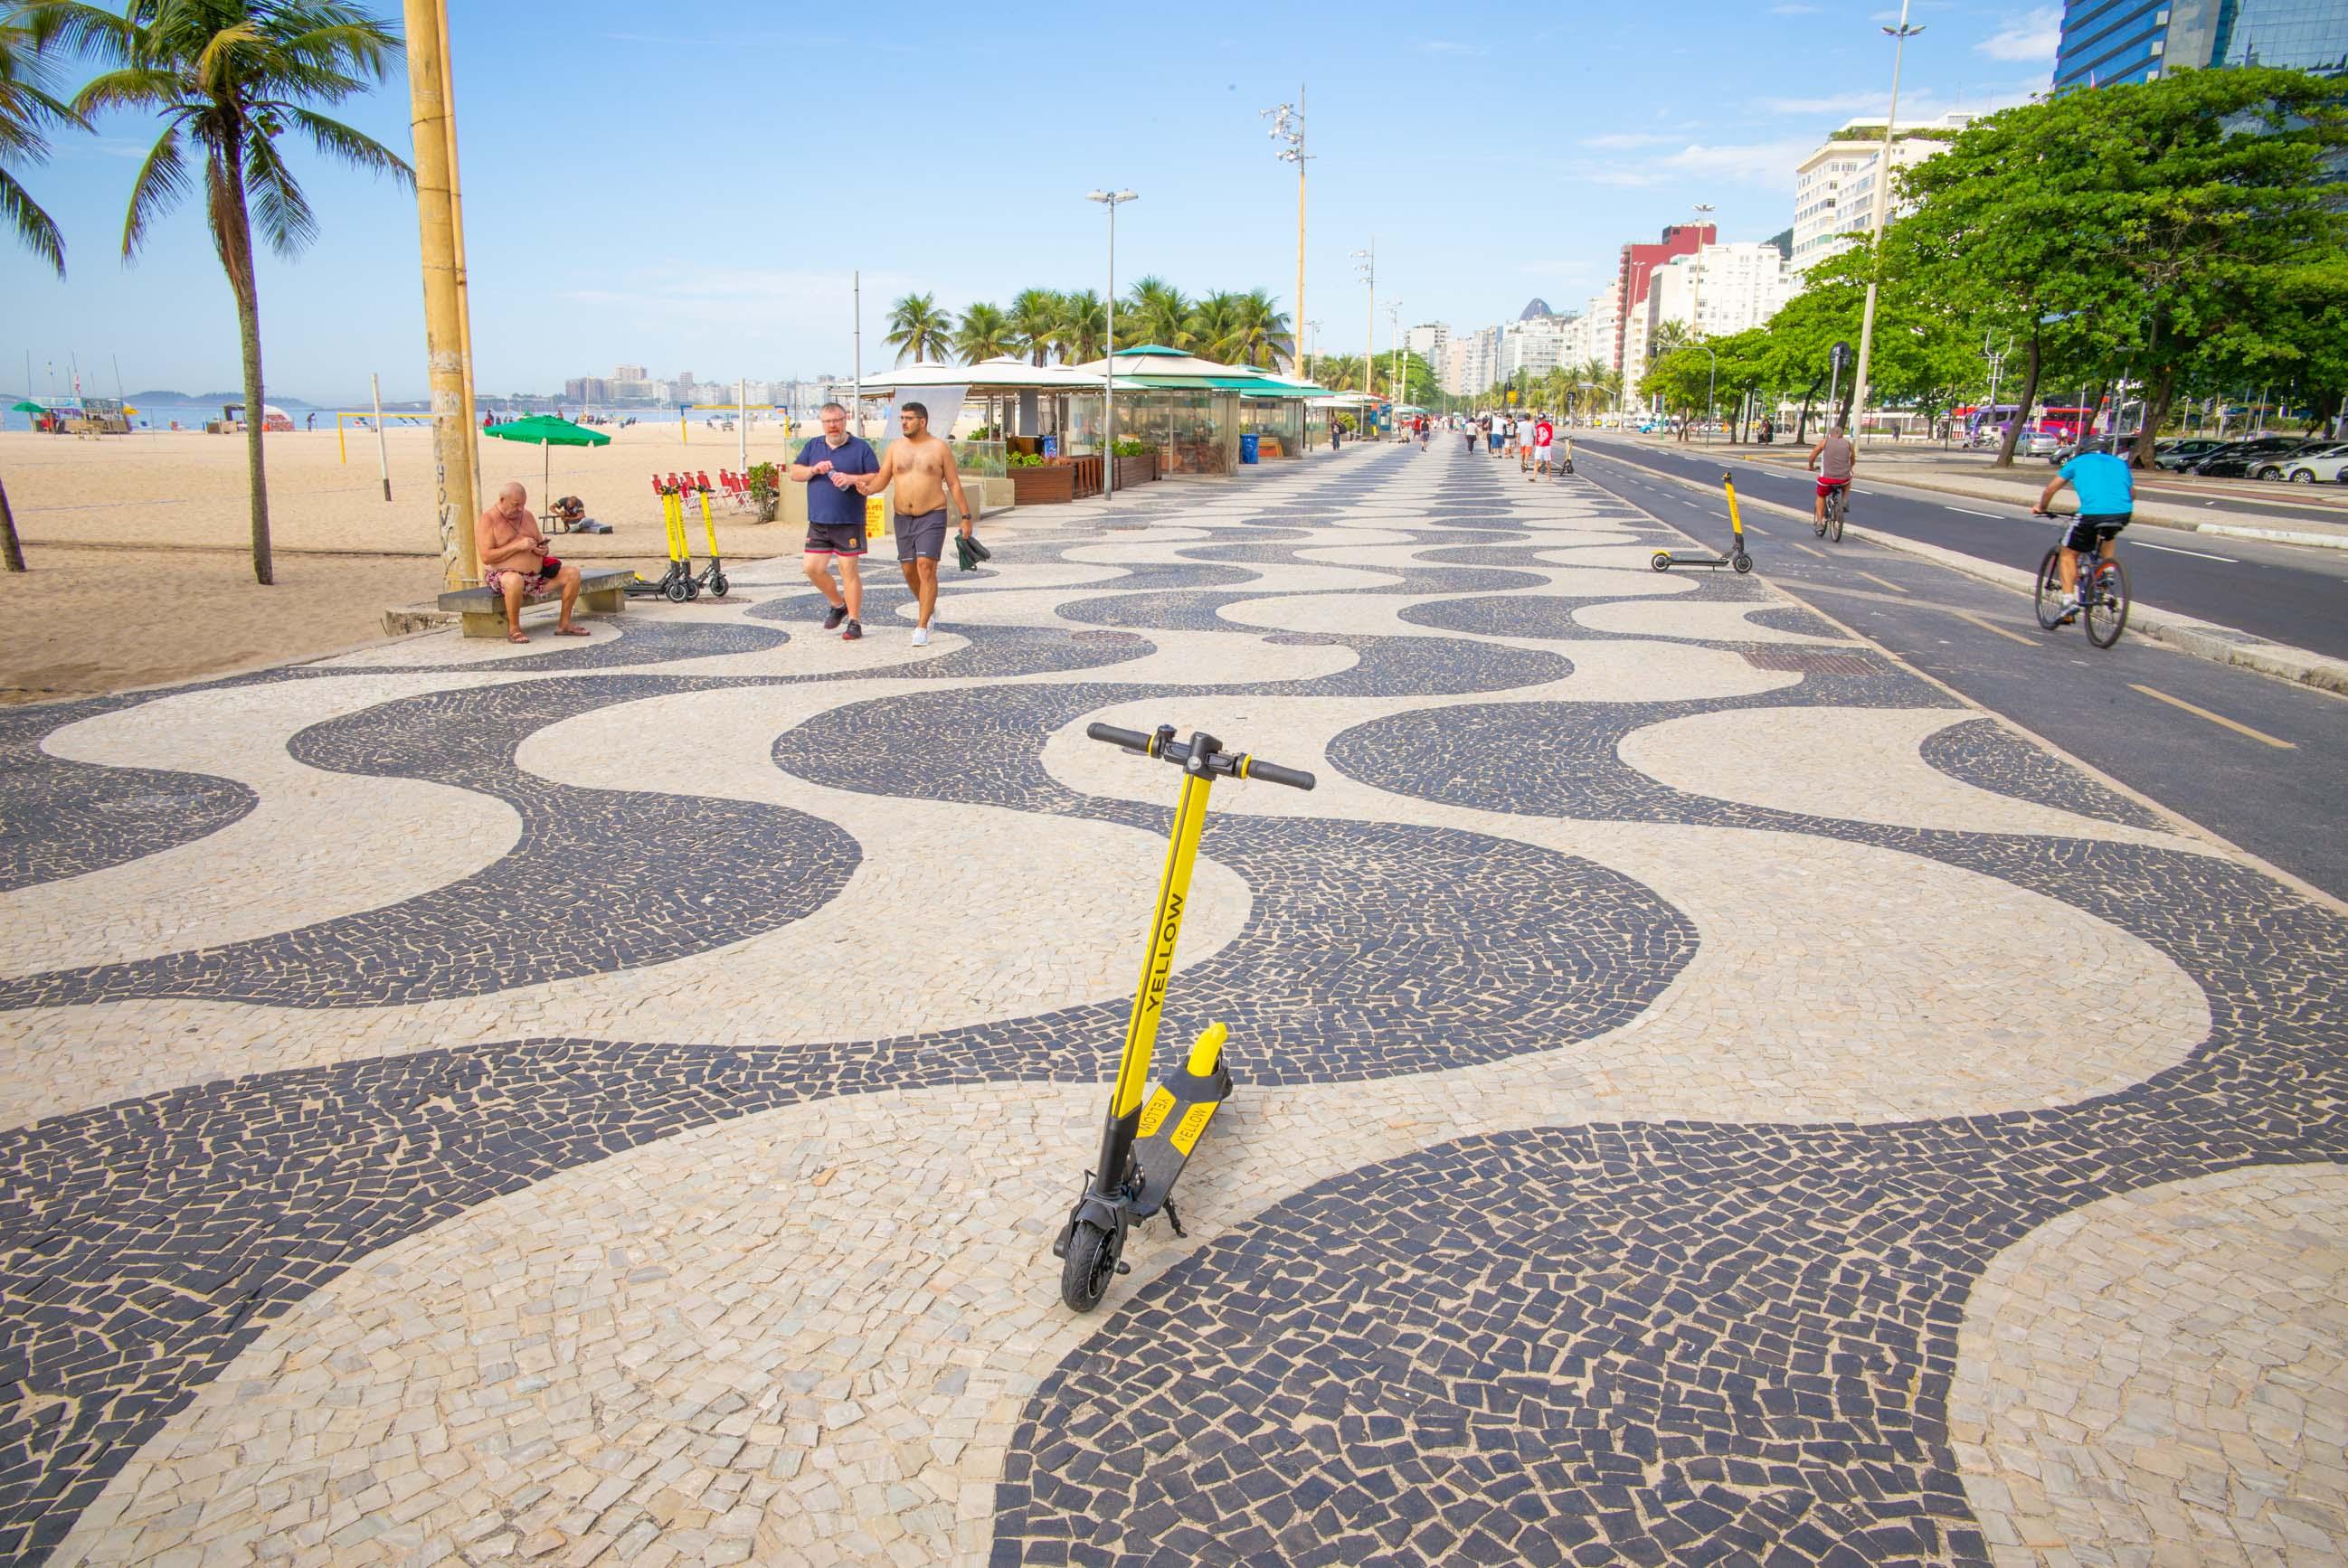 https://bubo.sk/uploads/galleries/7343/lubosfellner_brazilia_cos_l1006979-22.jpg